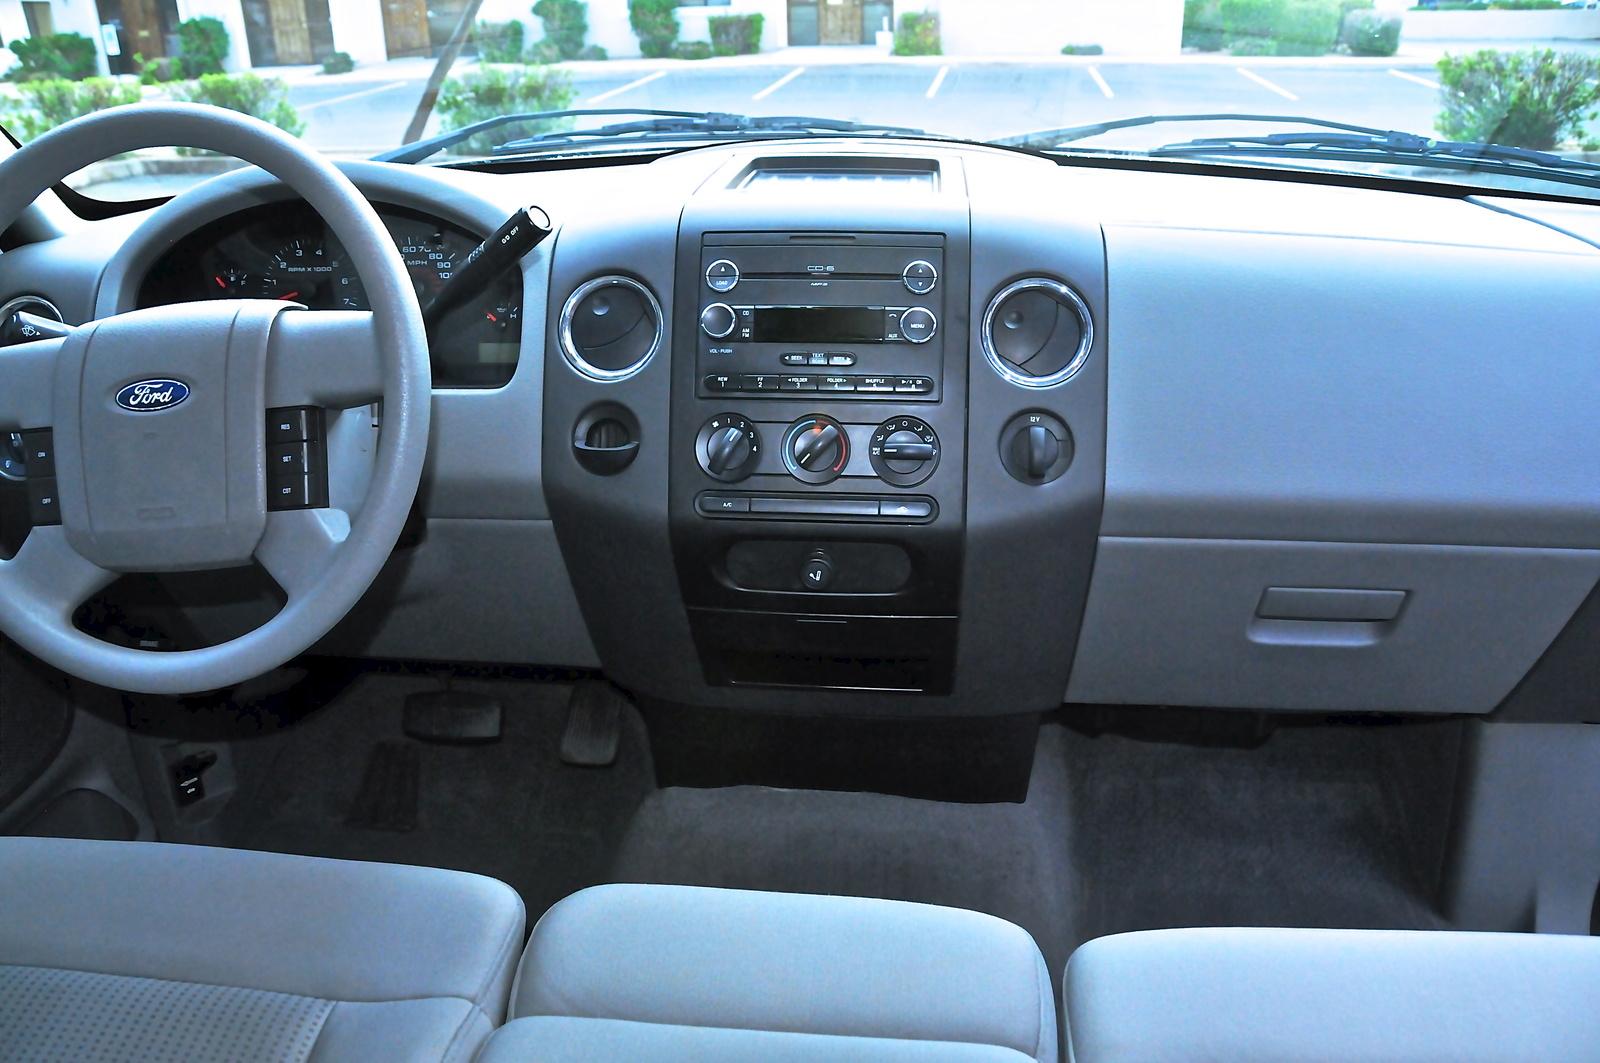 2005 ford f150 xlt radio wiring diagram honeywell thermostat th4110d1007 free engine